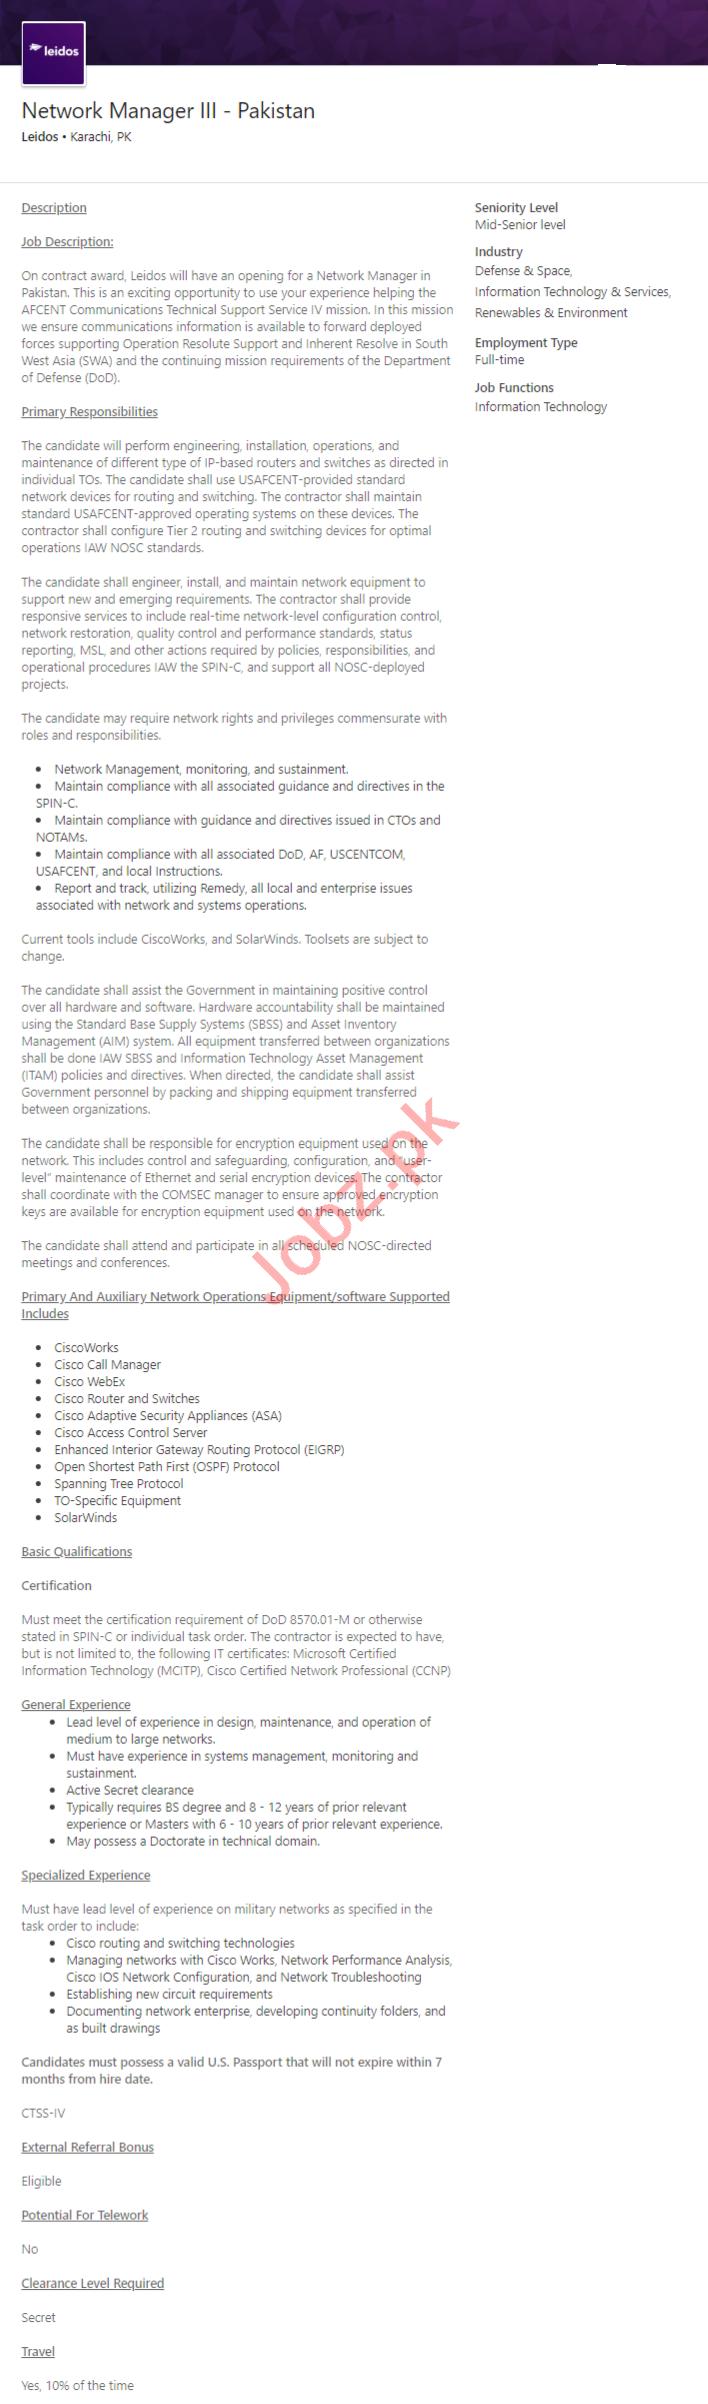 Leidos Karachi Jobs 2020 for Network Manager